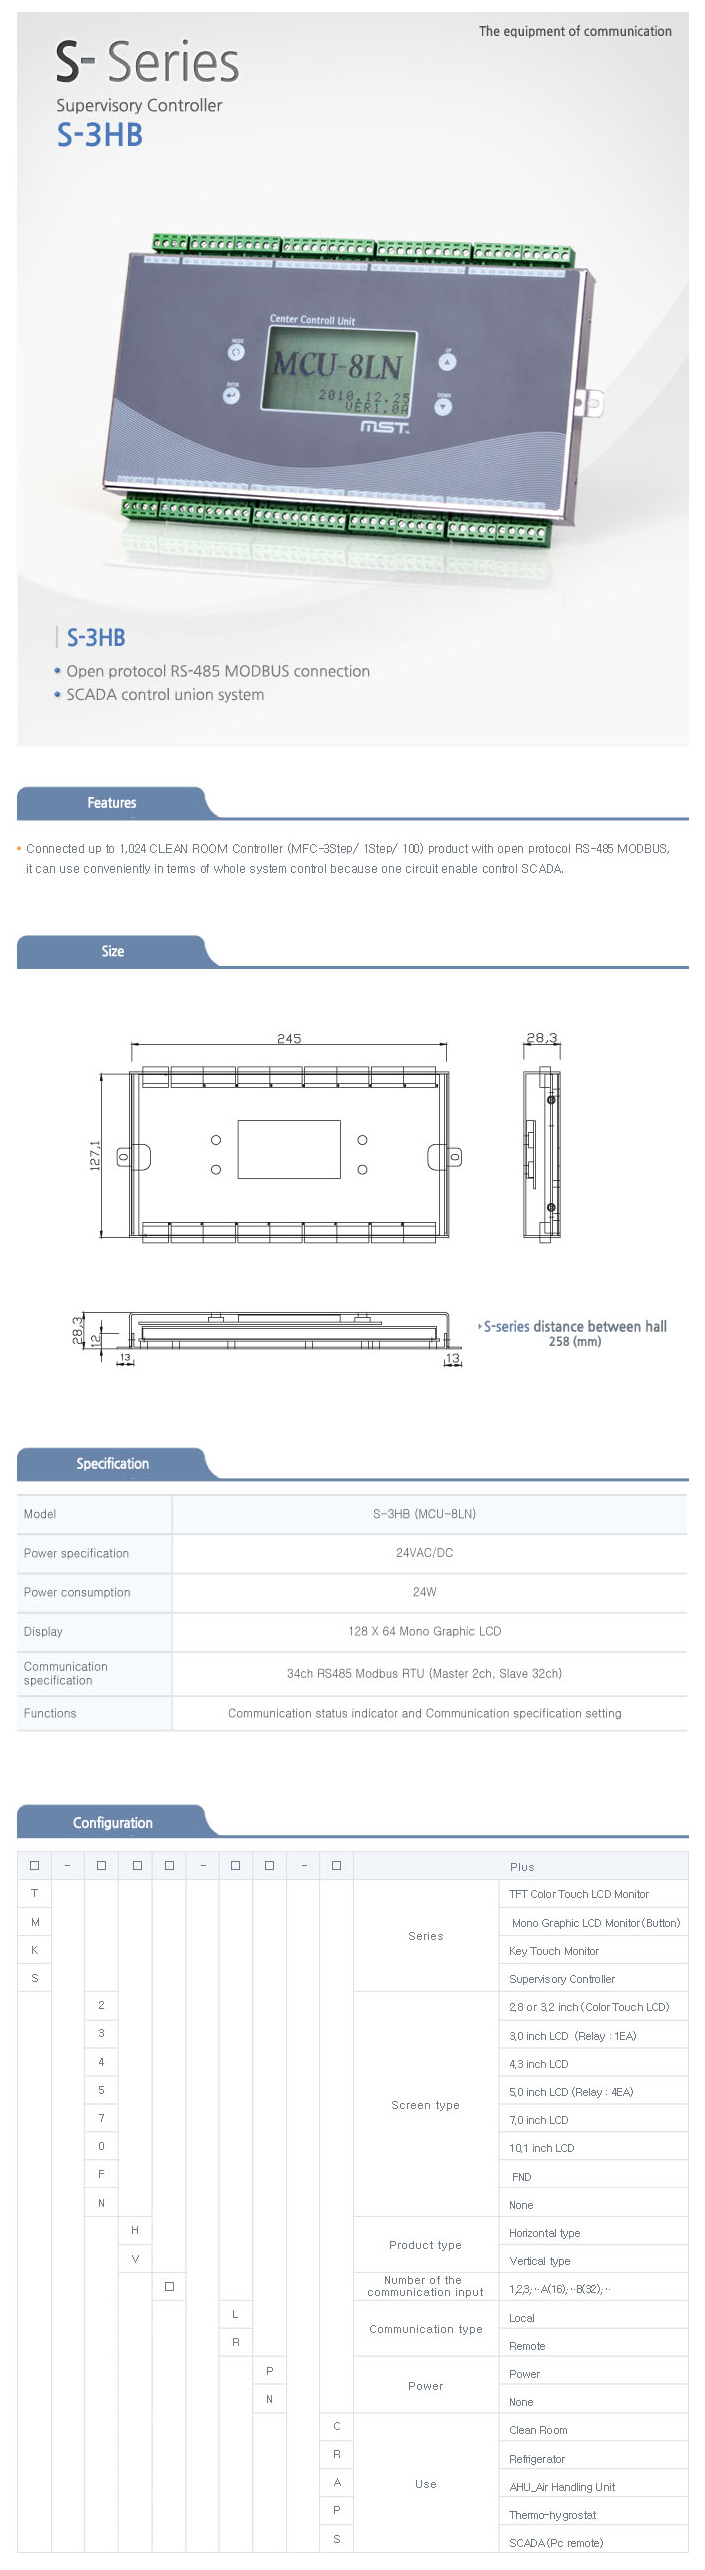 MST Supervisory Controller (S-3HB) S-Series (32port)